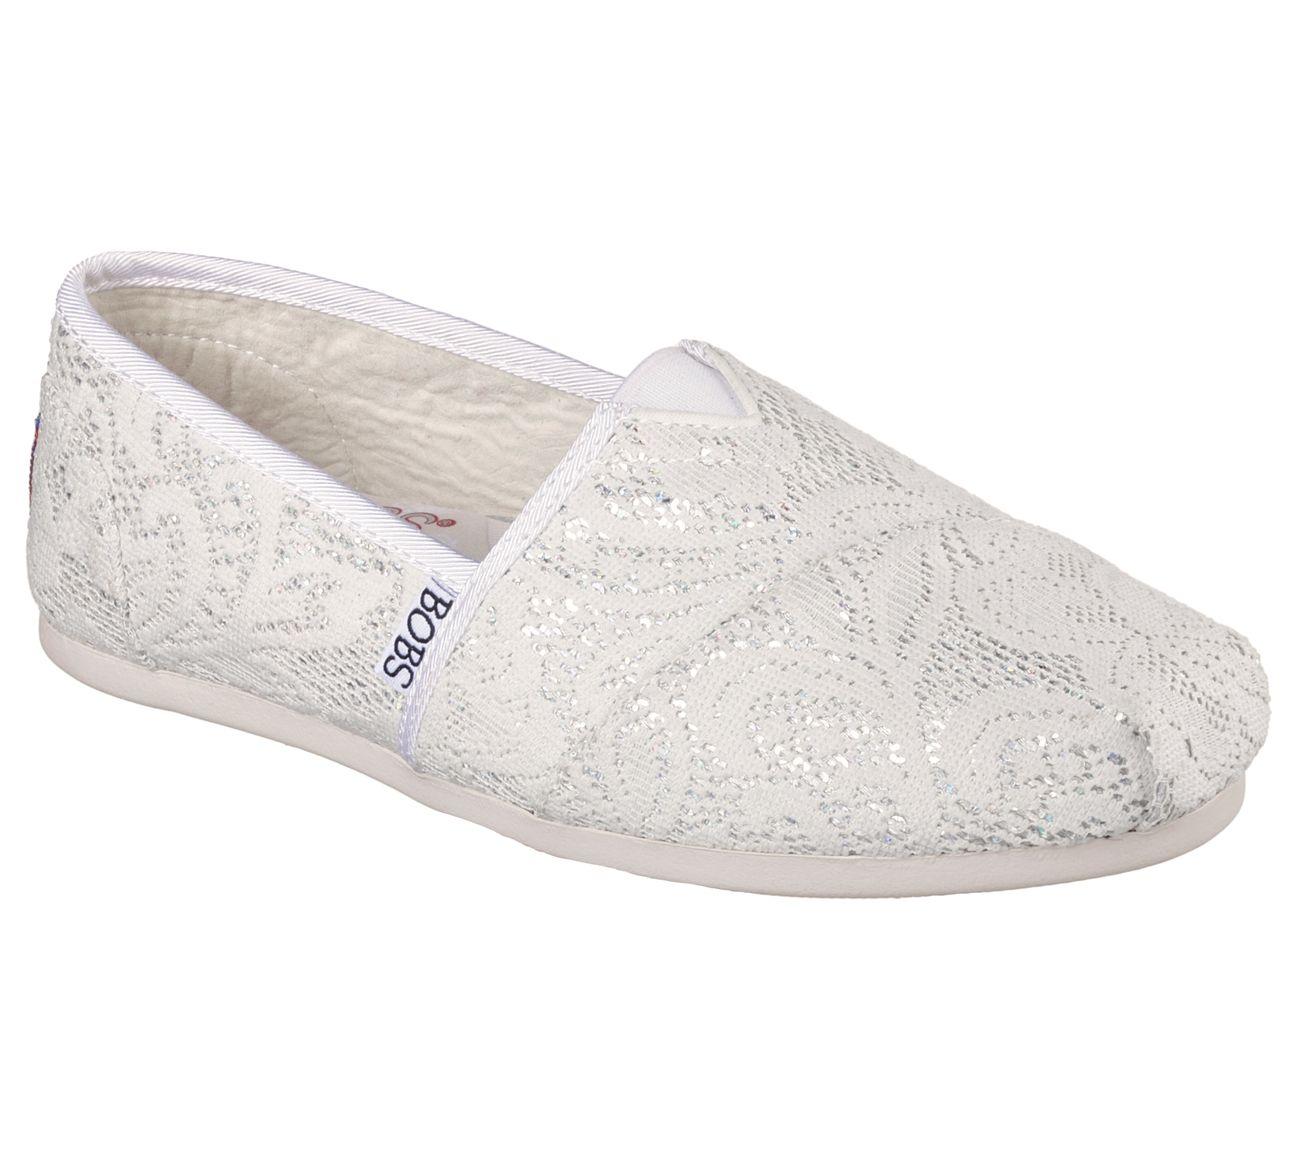 Sketchers shoes women, Skechers bobs